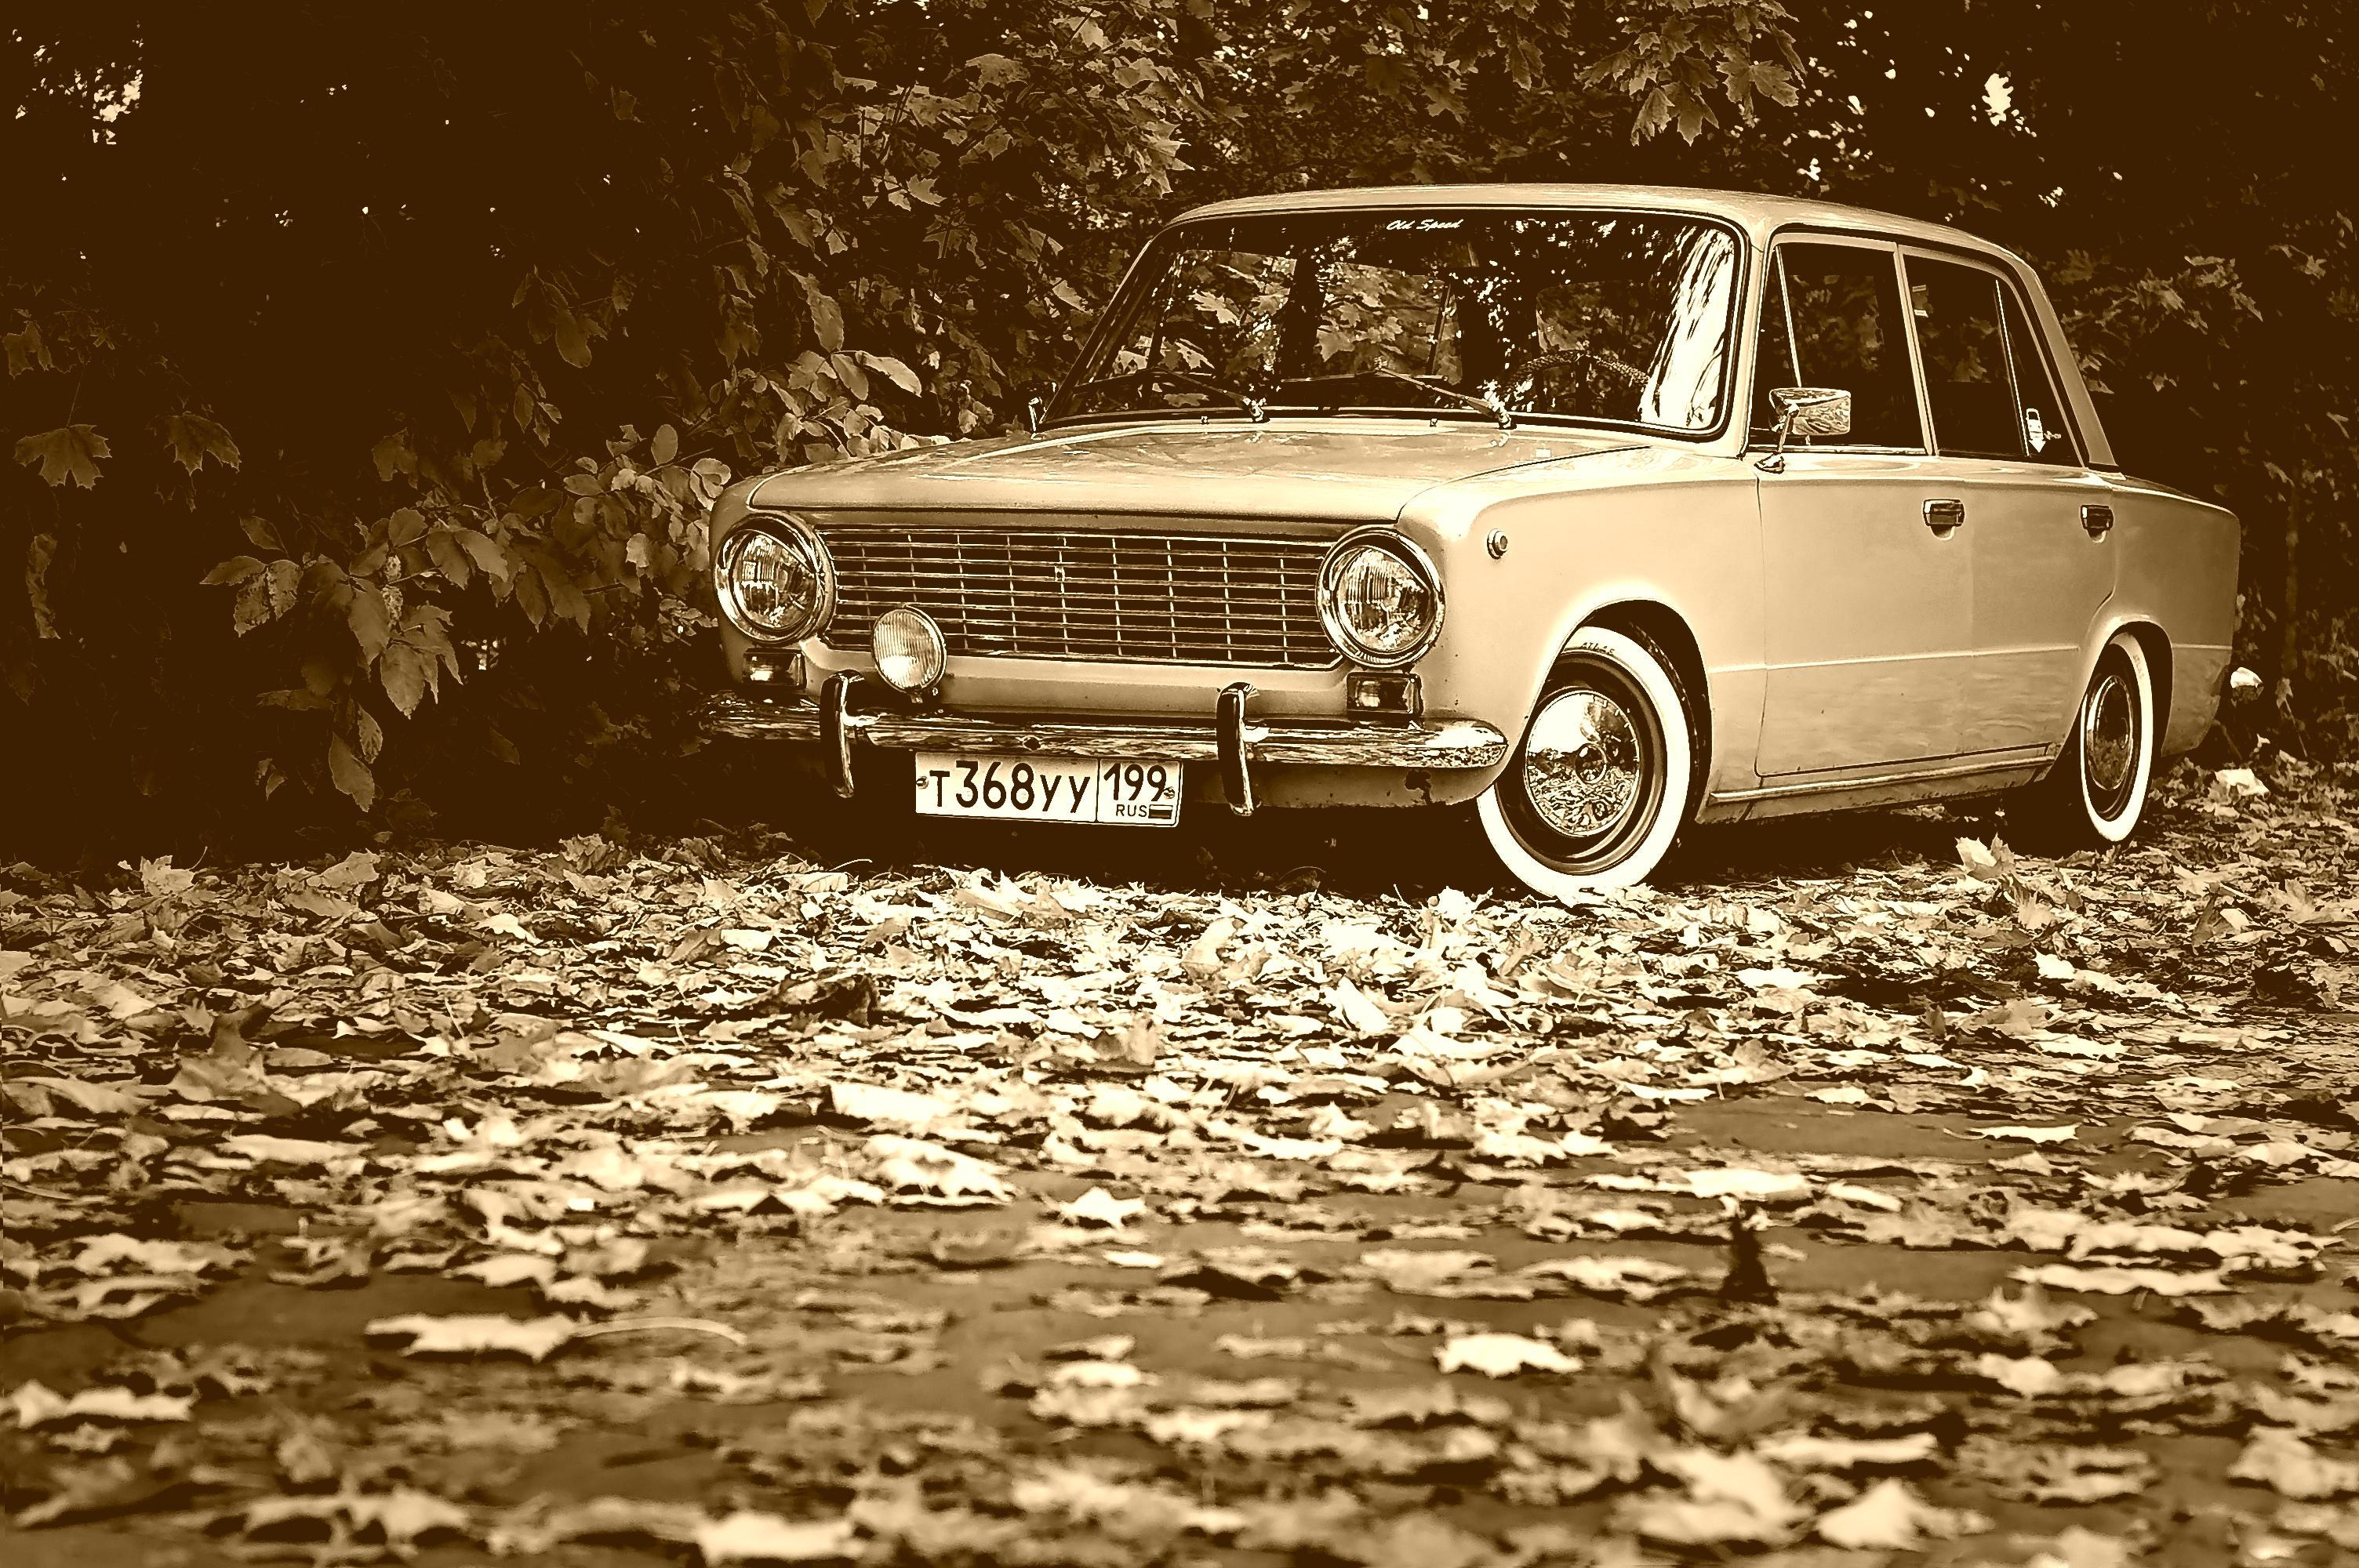 Black And White Wallpaper Old Vintage Car